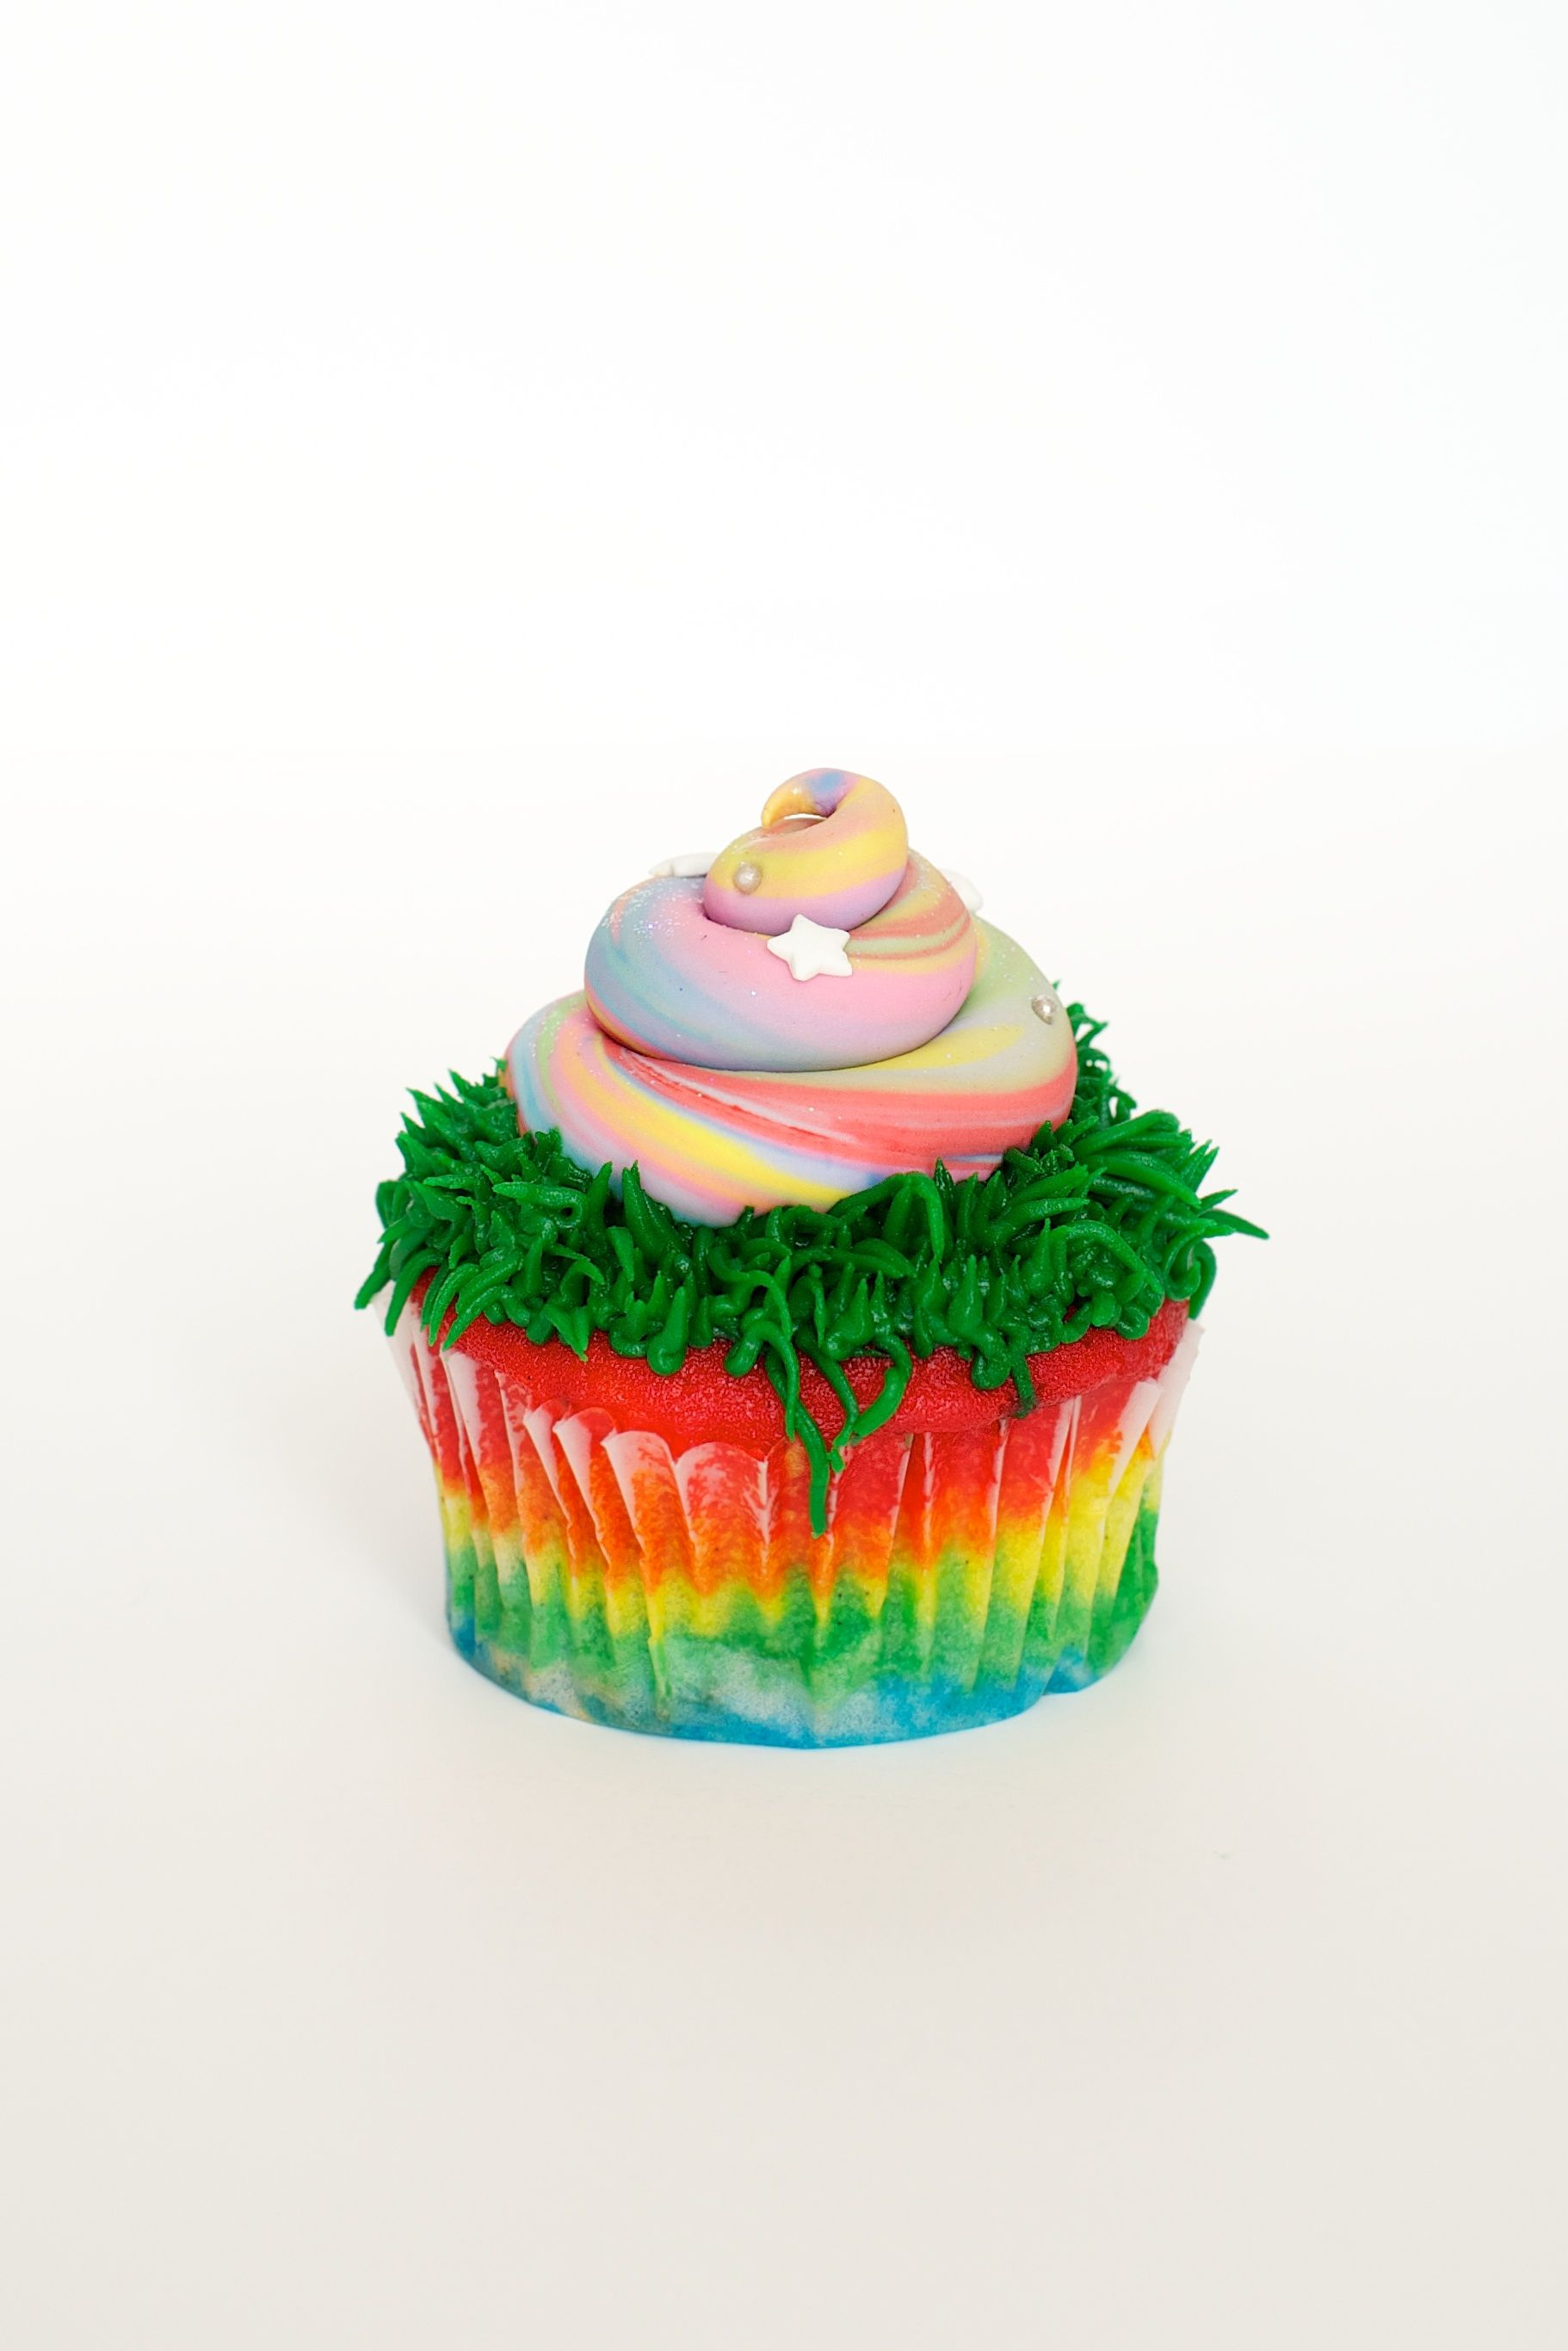 Alfa img - Showing > Unicorn Poop Cupcakes Recipe Unicorn Poop Cupcakes